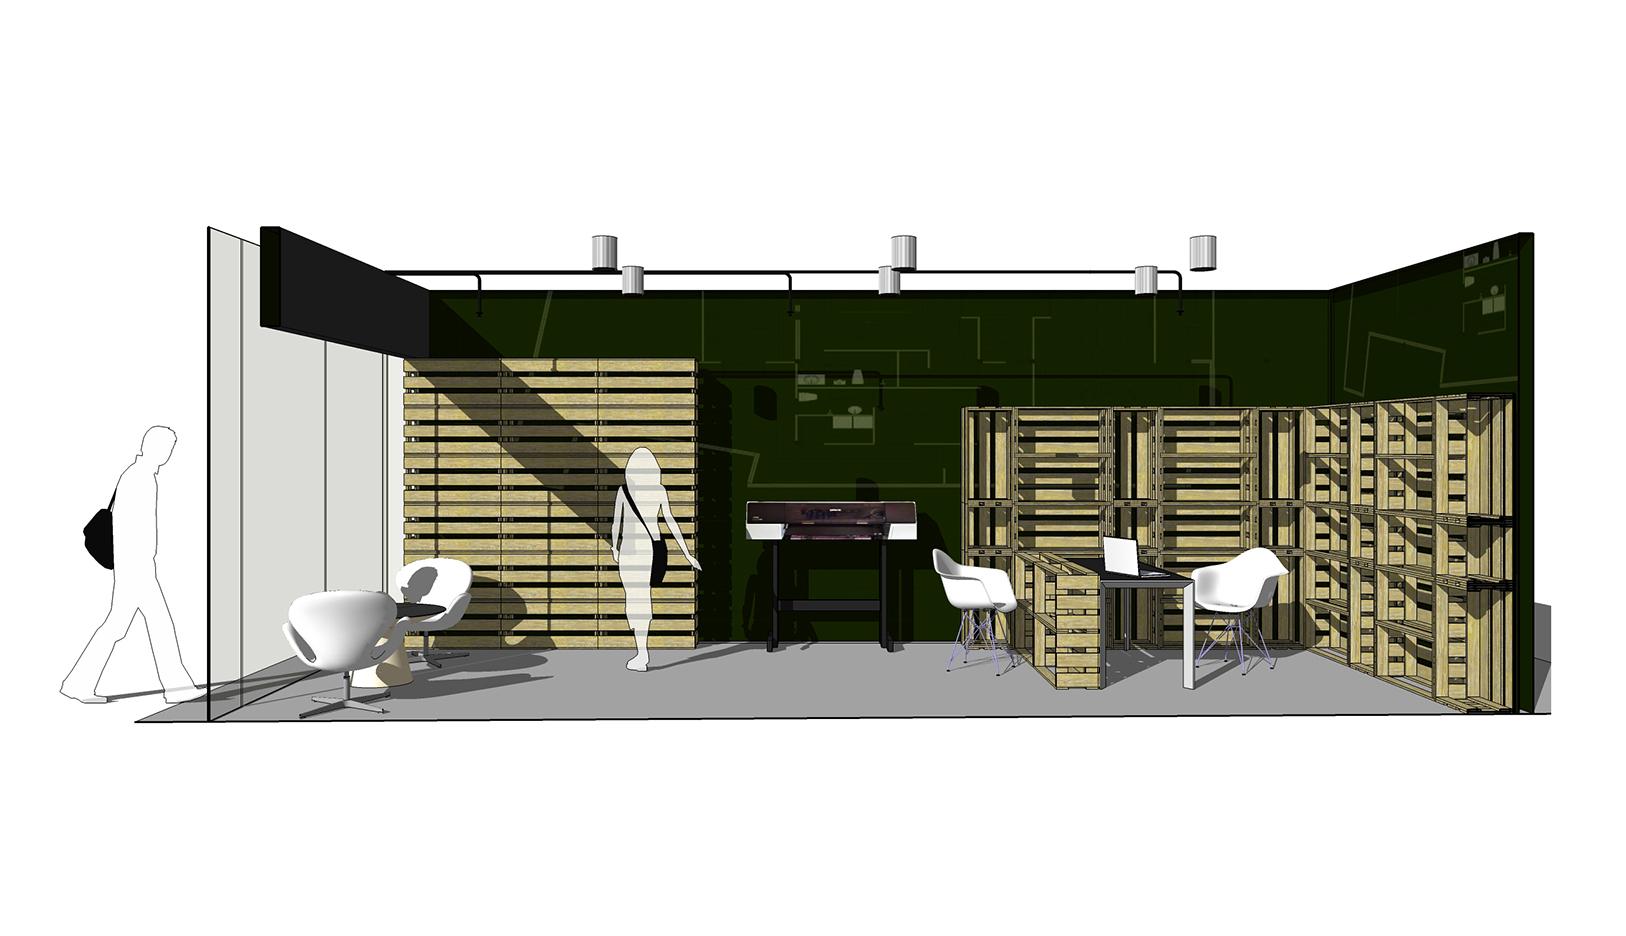 10DESIGN interior design goon studio photo paint shop retail commercial design 01